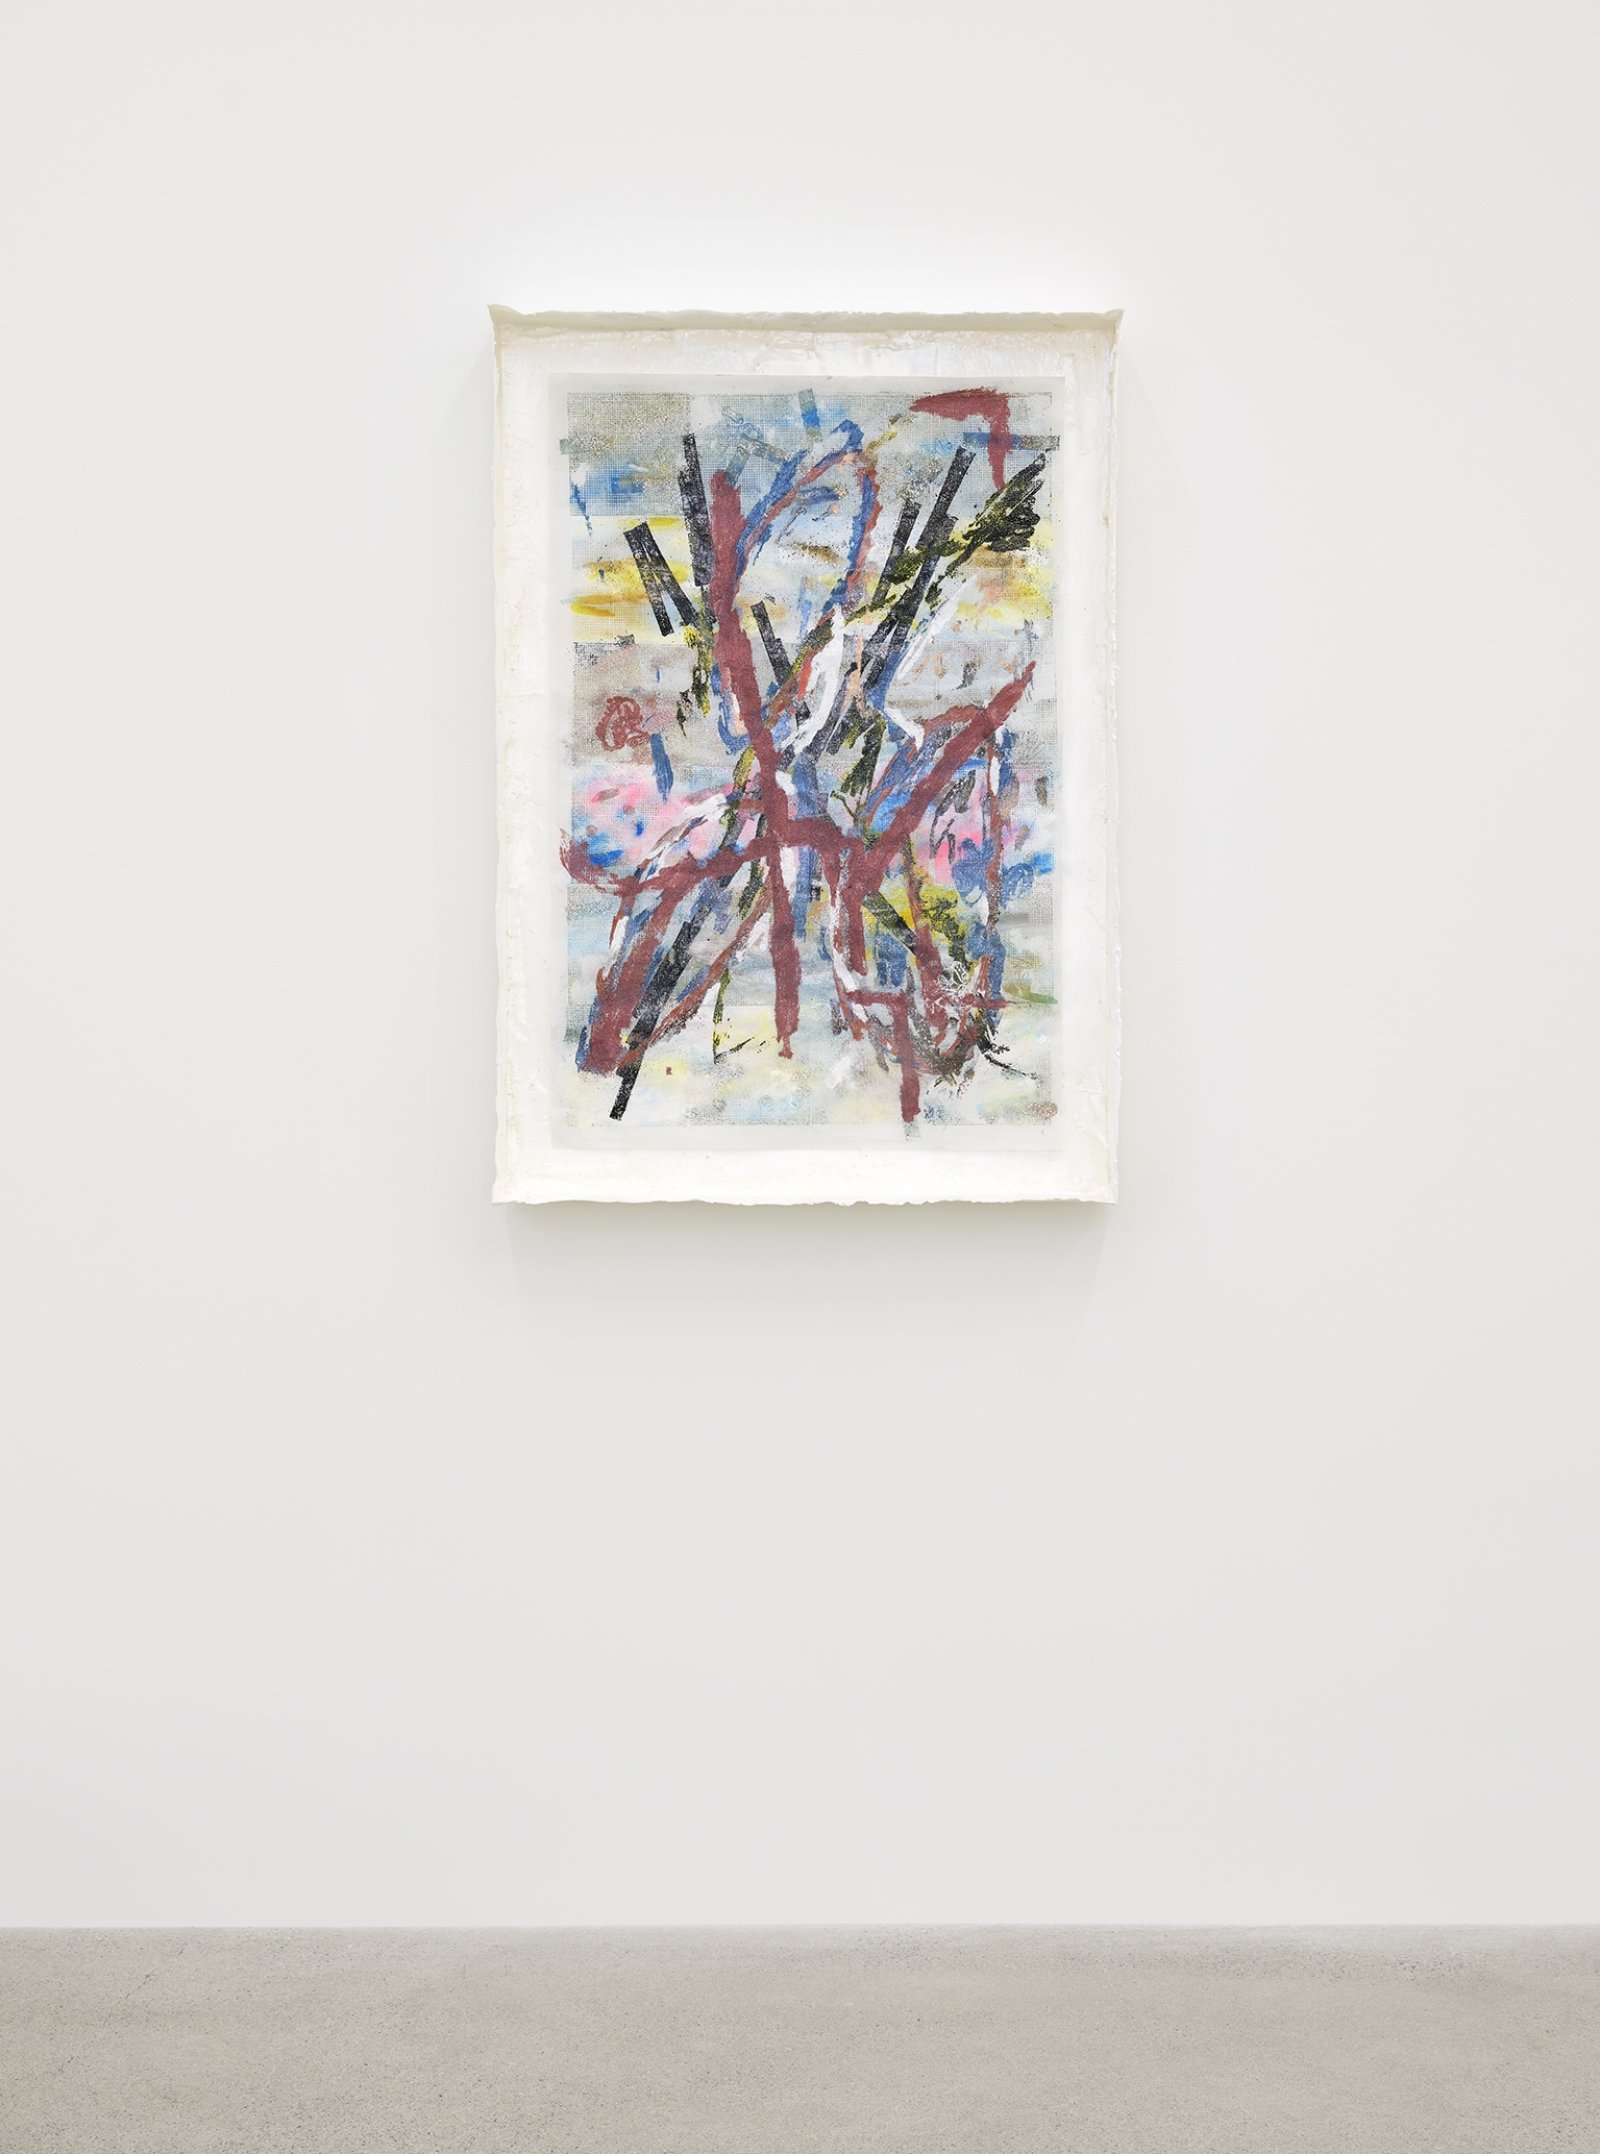 Rebecca Brewer, Live Resin: Flood Notes, 2019, urethane resin, aluminum mesh, pigment, plexiglas, embossing powder on vellum, 41 x 29 in. (104 x 74 cm)